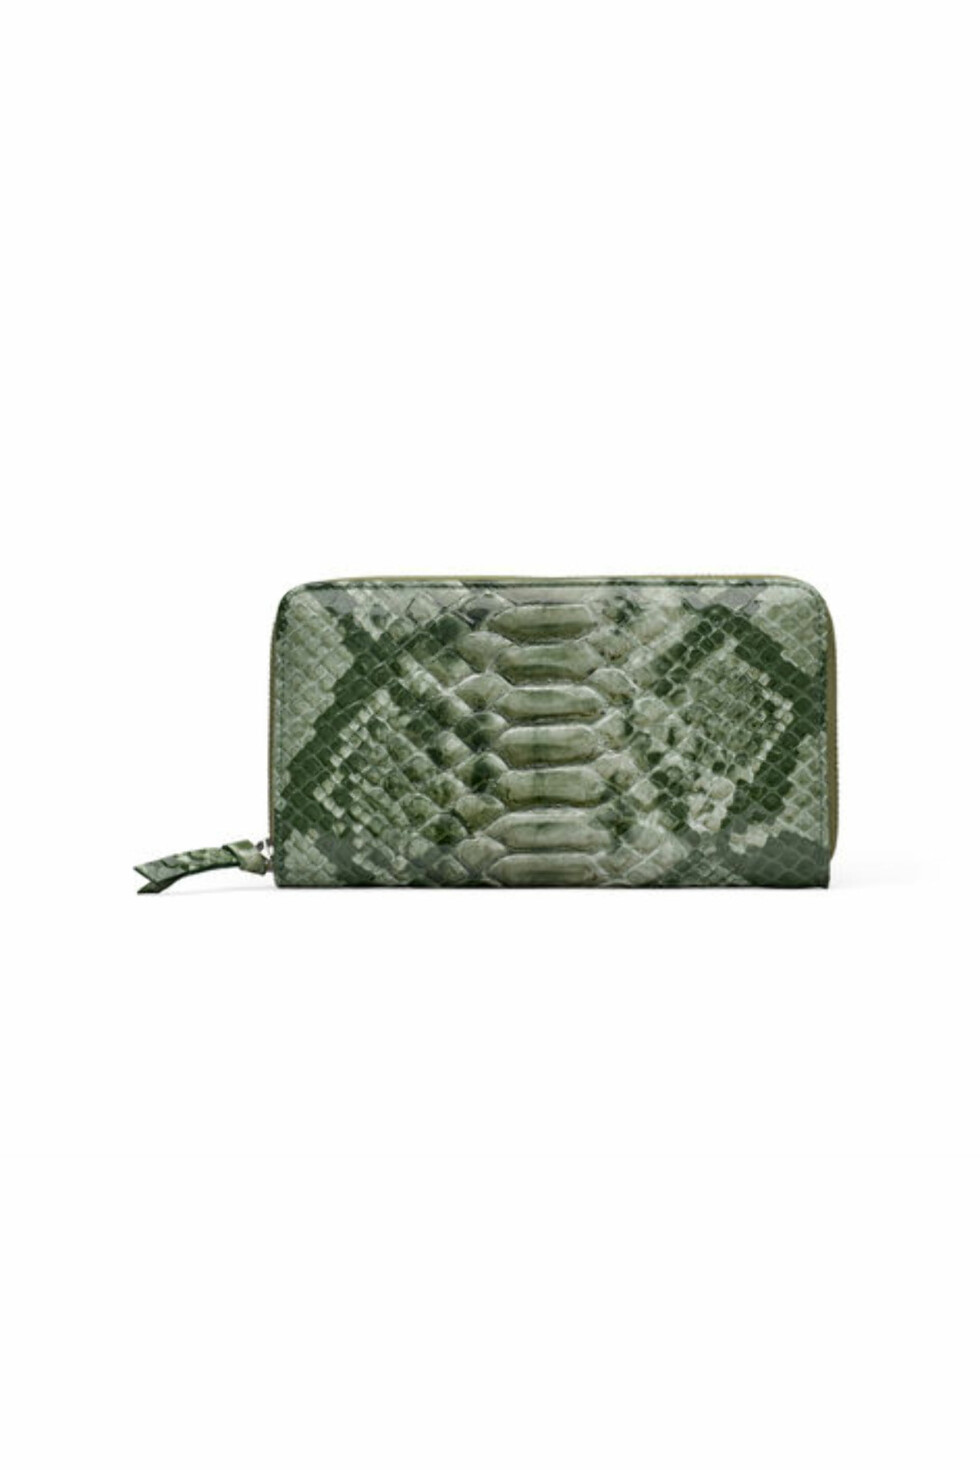 <strong>Lommebok fra Ganni | kr 1749 | http:</strong>//www.ganni.com/shop/bags/gallery-accessories-purse/A0839.html?dwvar_A0839_color=Botanical%20Snake